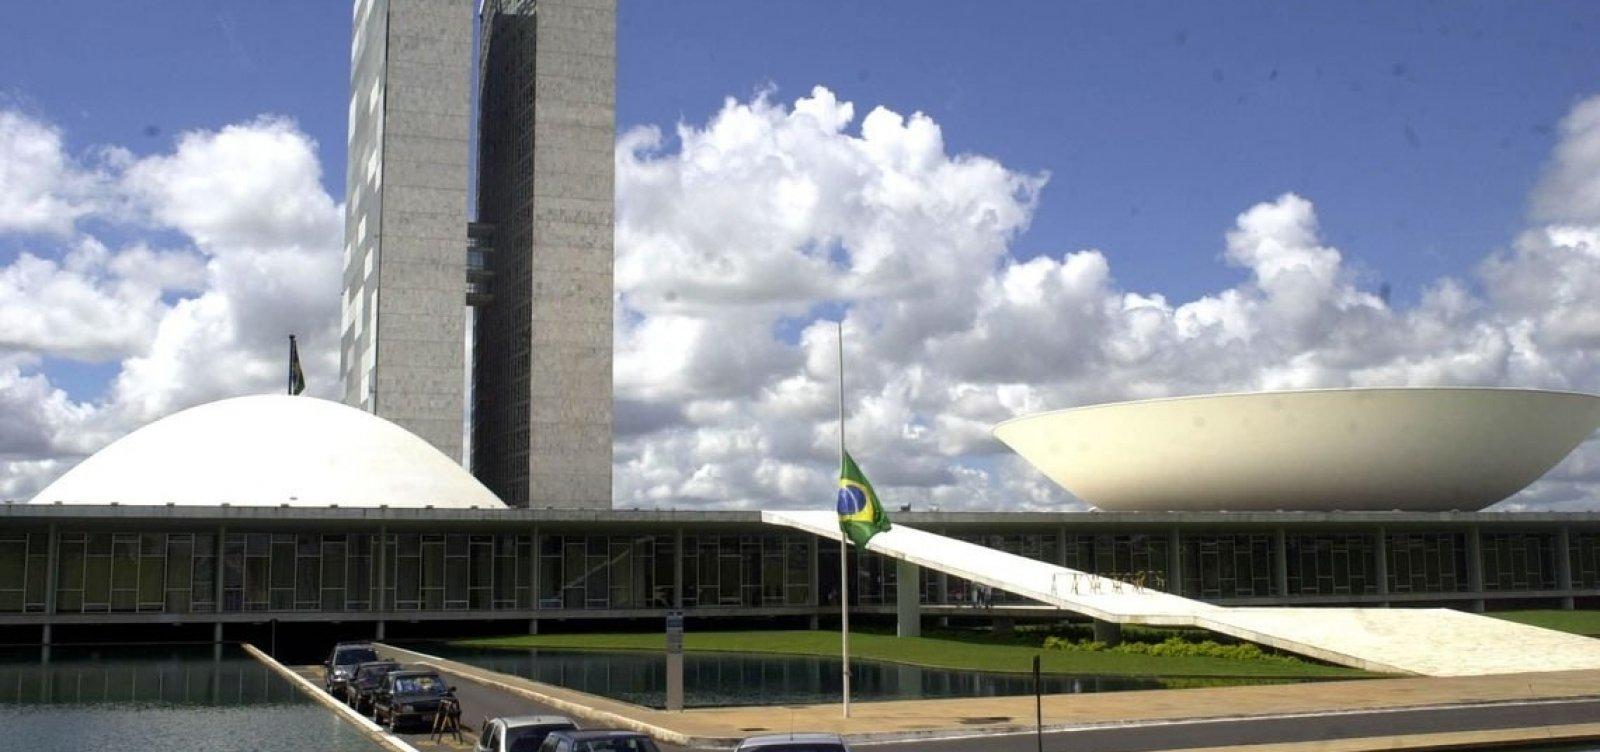 Governo prioriza parlamentares aliados ao liberar emendas